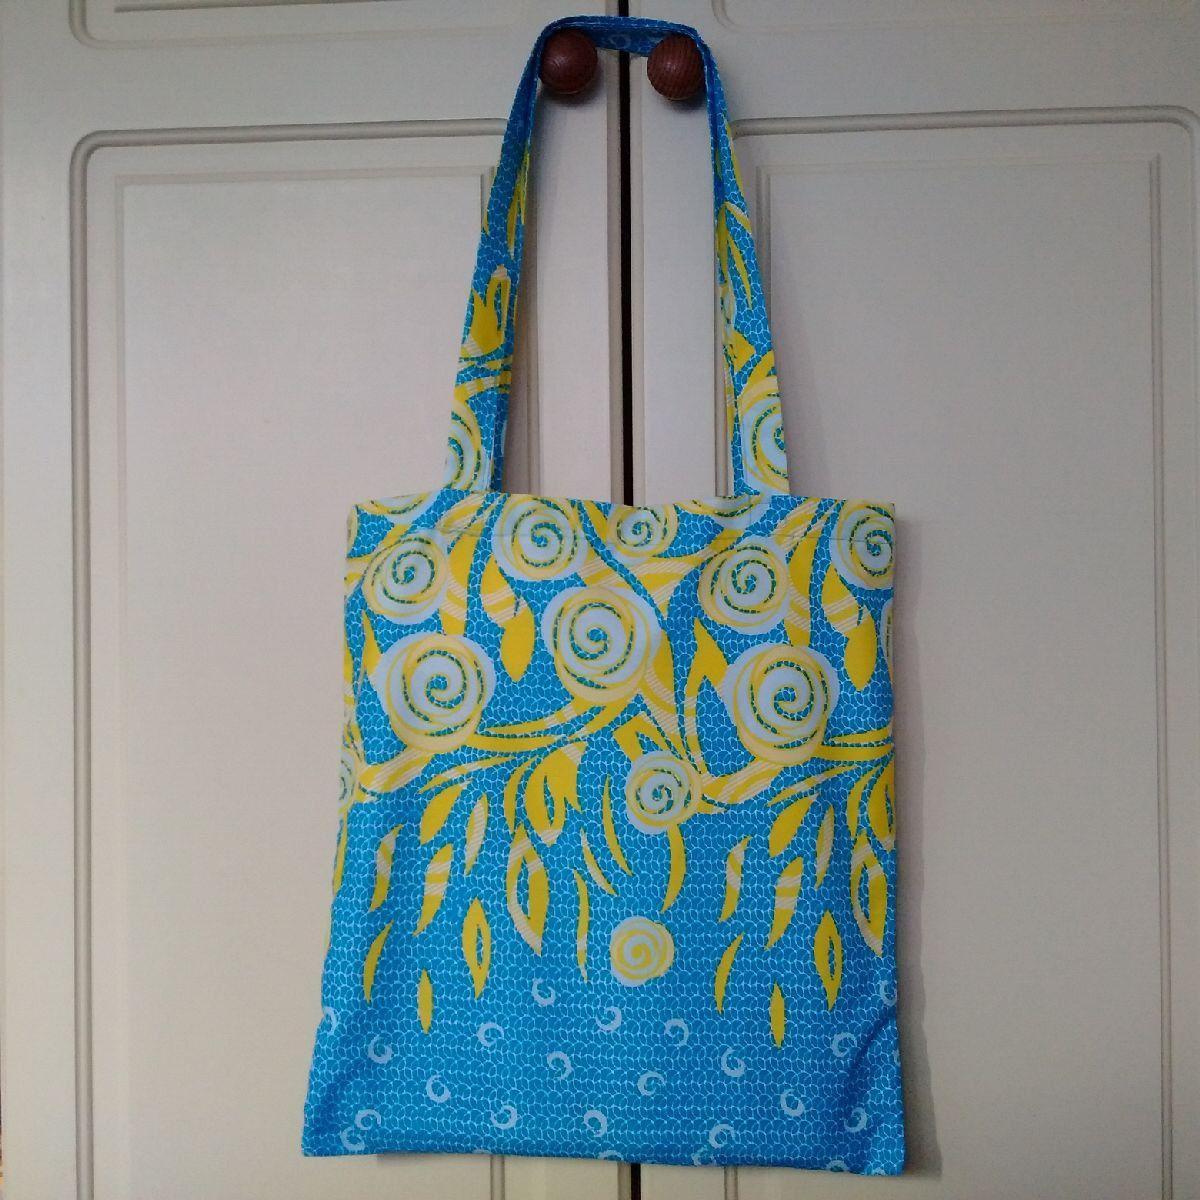 African print Tote bag Christmas Stocking Filler Stuffer Eco friendly cotton Bag Boho Chic Tote Bag Reusable Tote bag Detola and Geek (12.00 GBP) by DetolaAndGeek http://ift.tt/1I81nGb